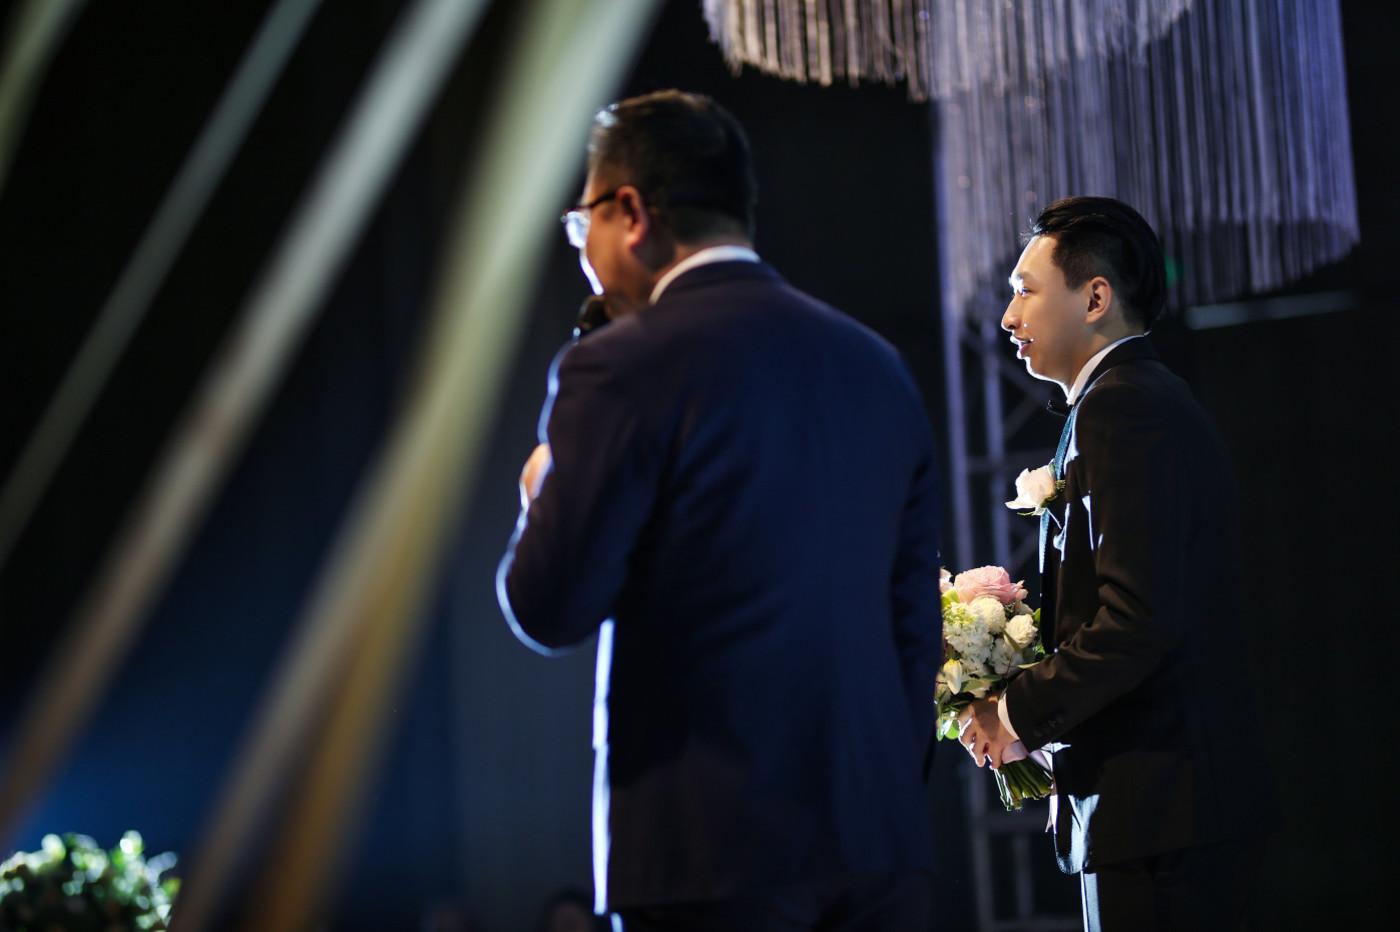 【KAI 婚礼纪实】Z&Y 常州婚礼24